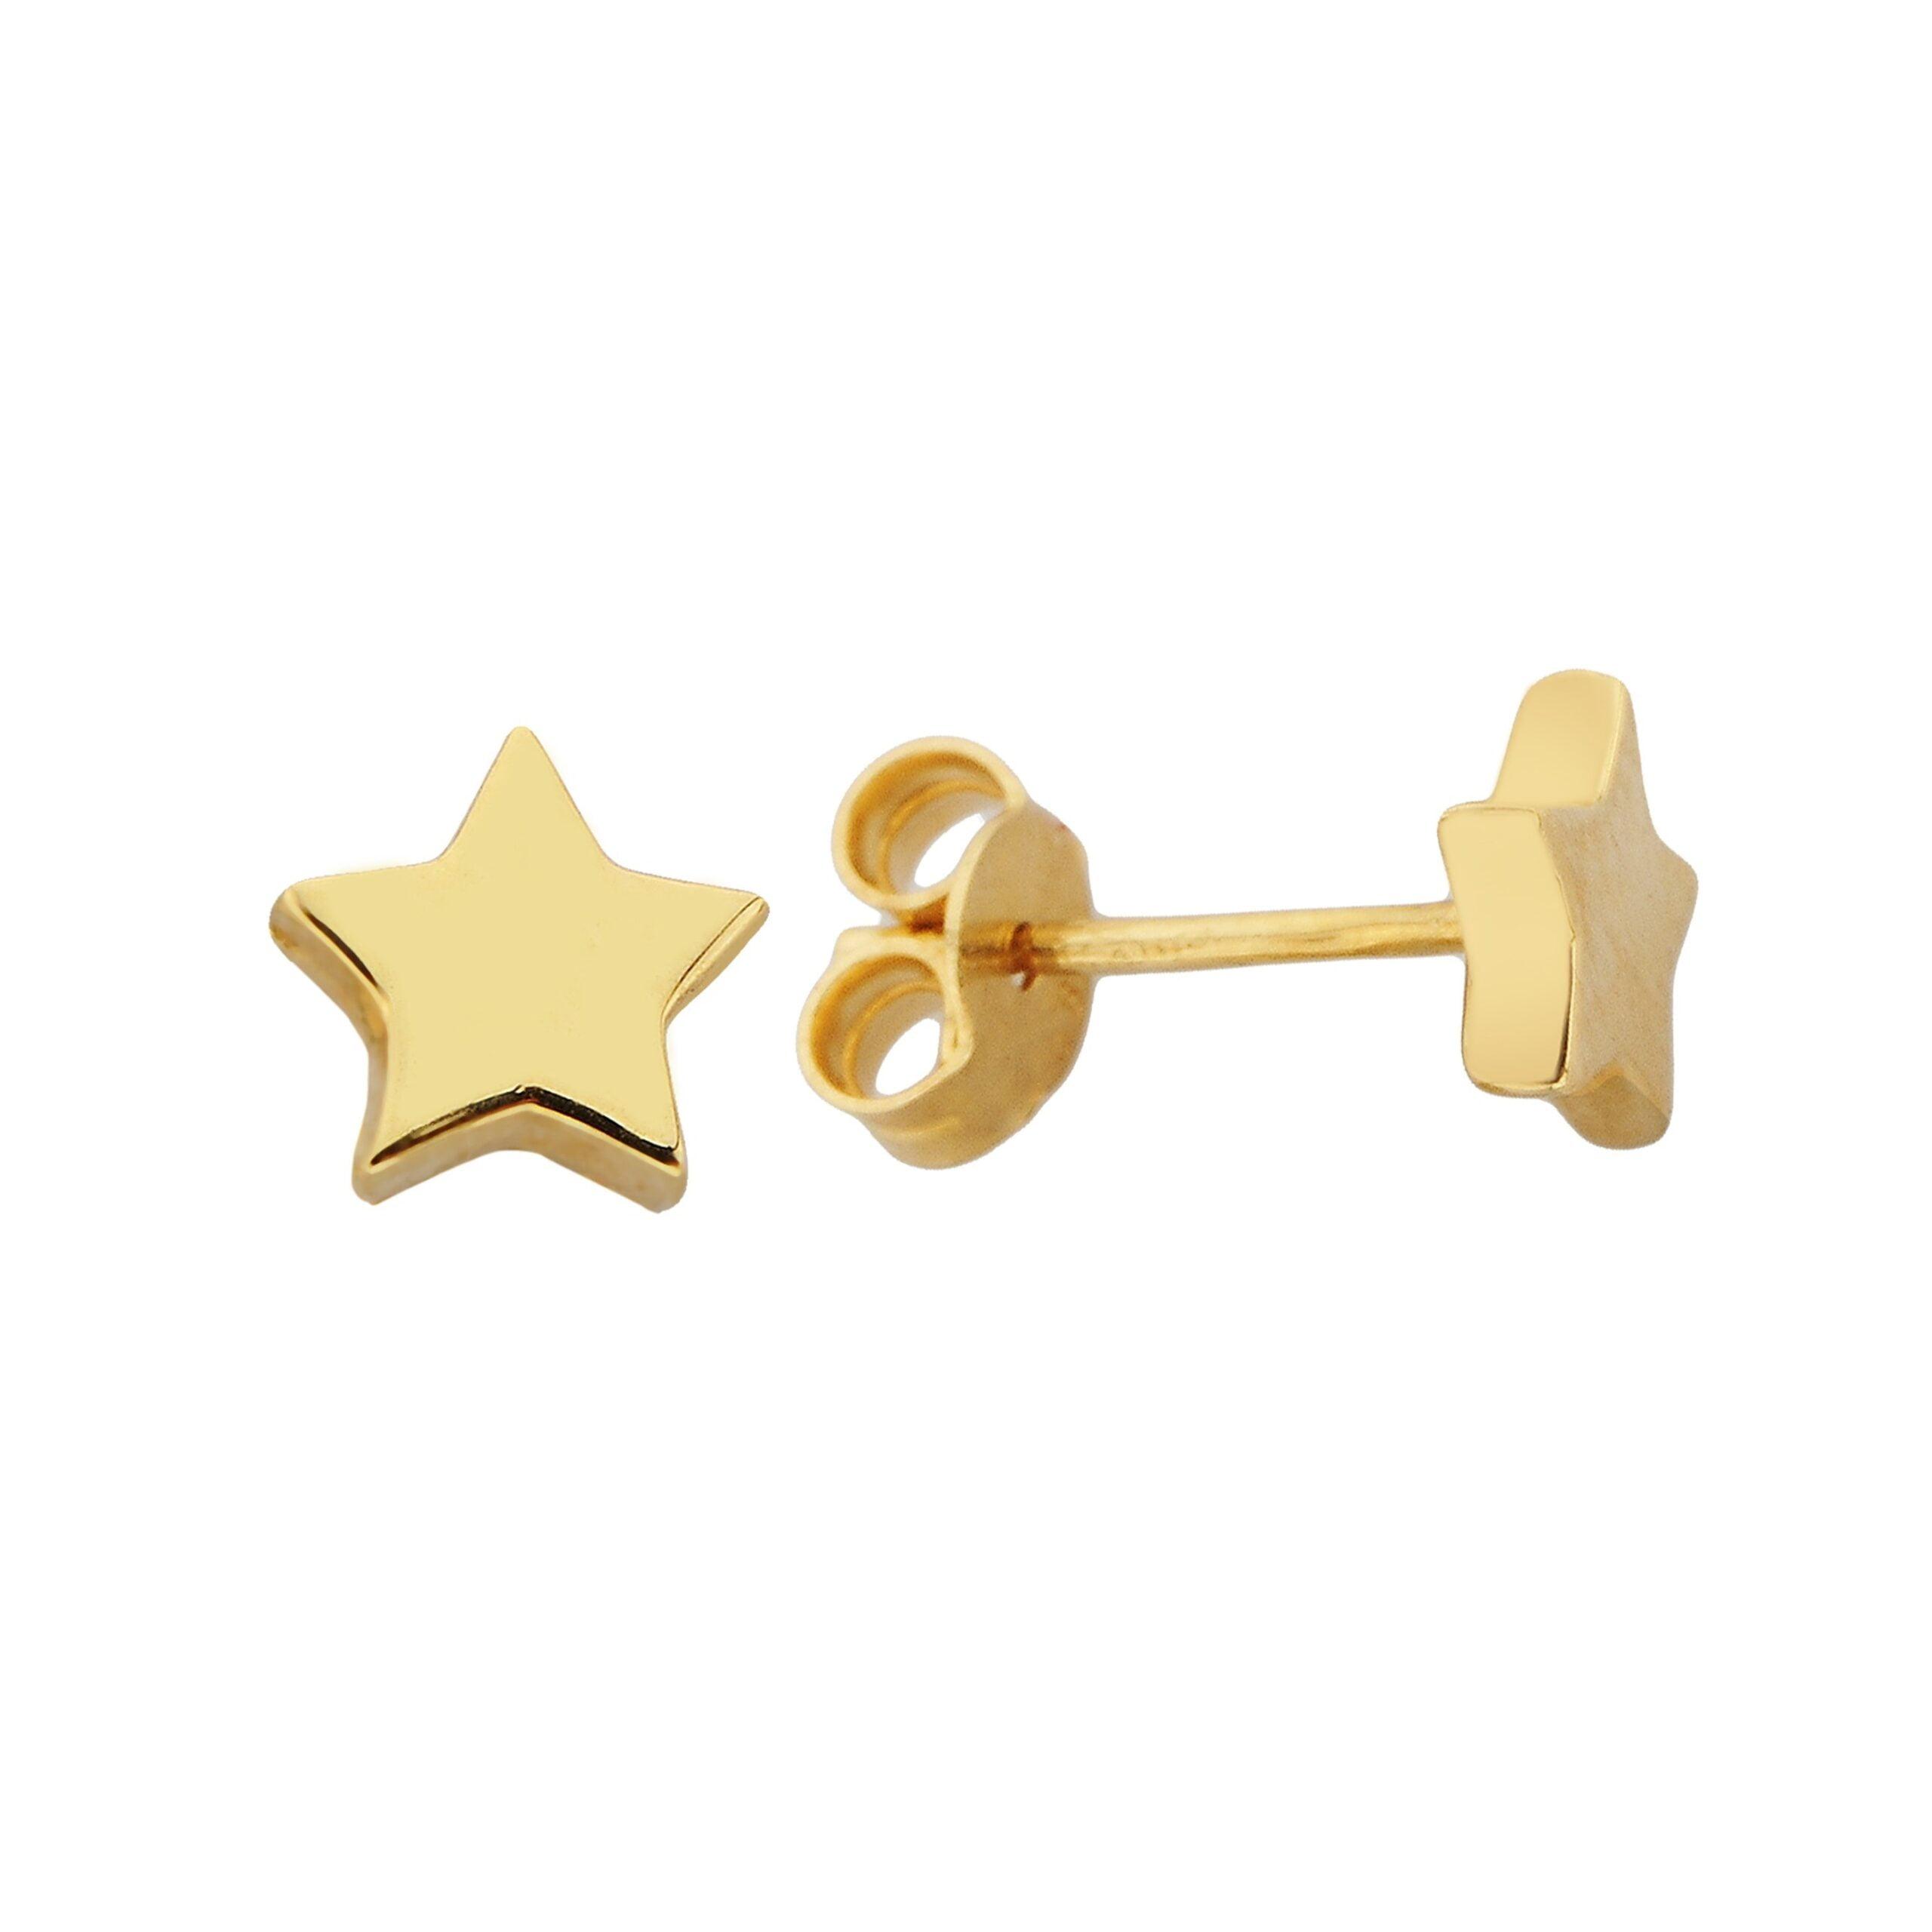 14K Solid Gold Star Stud Earrings for Women, Earrings Shaped desgin Best Birthday Gift christmas handmade jewelry